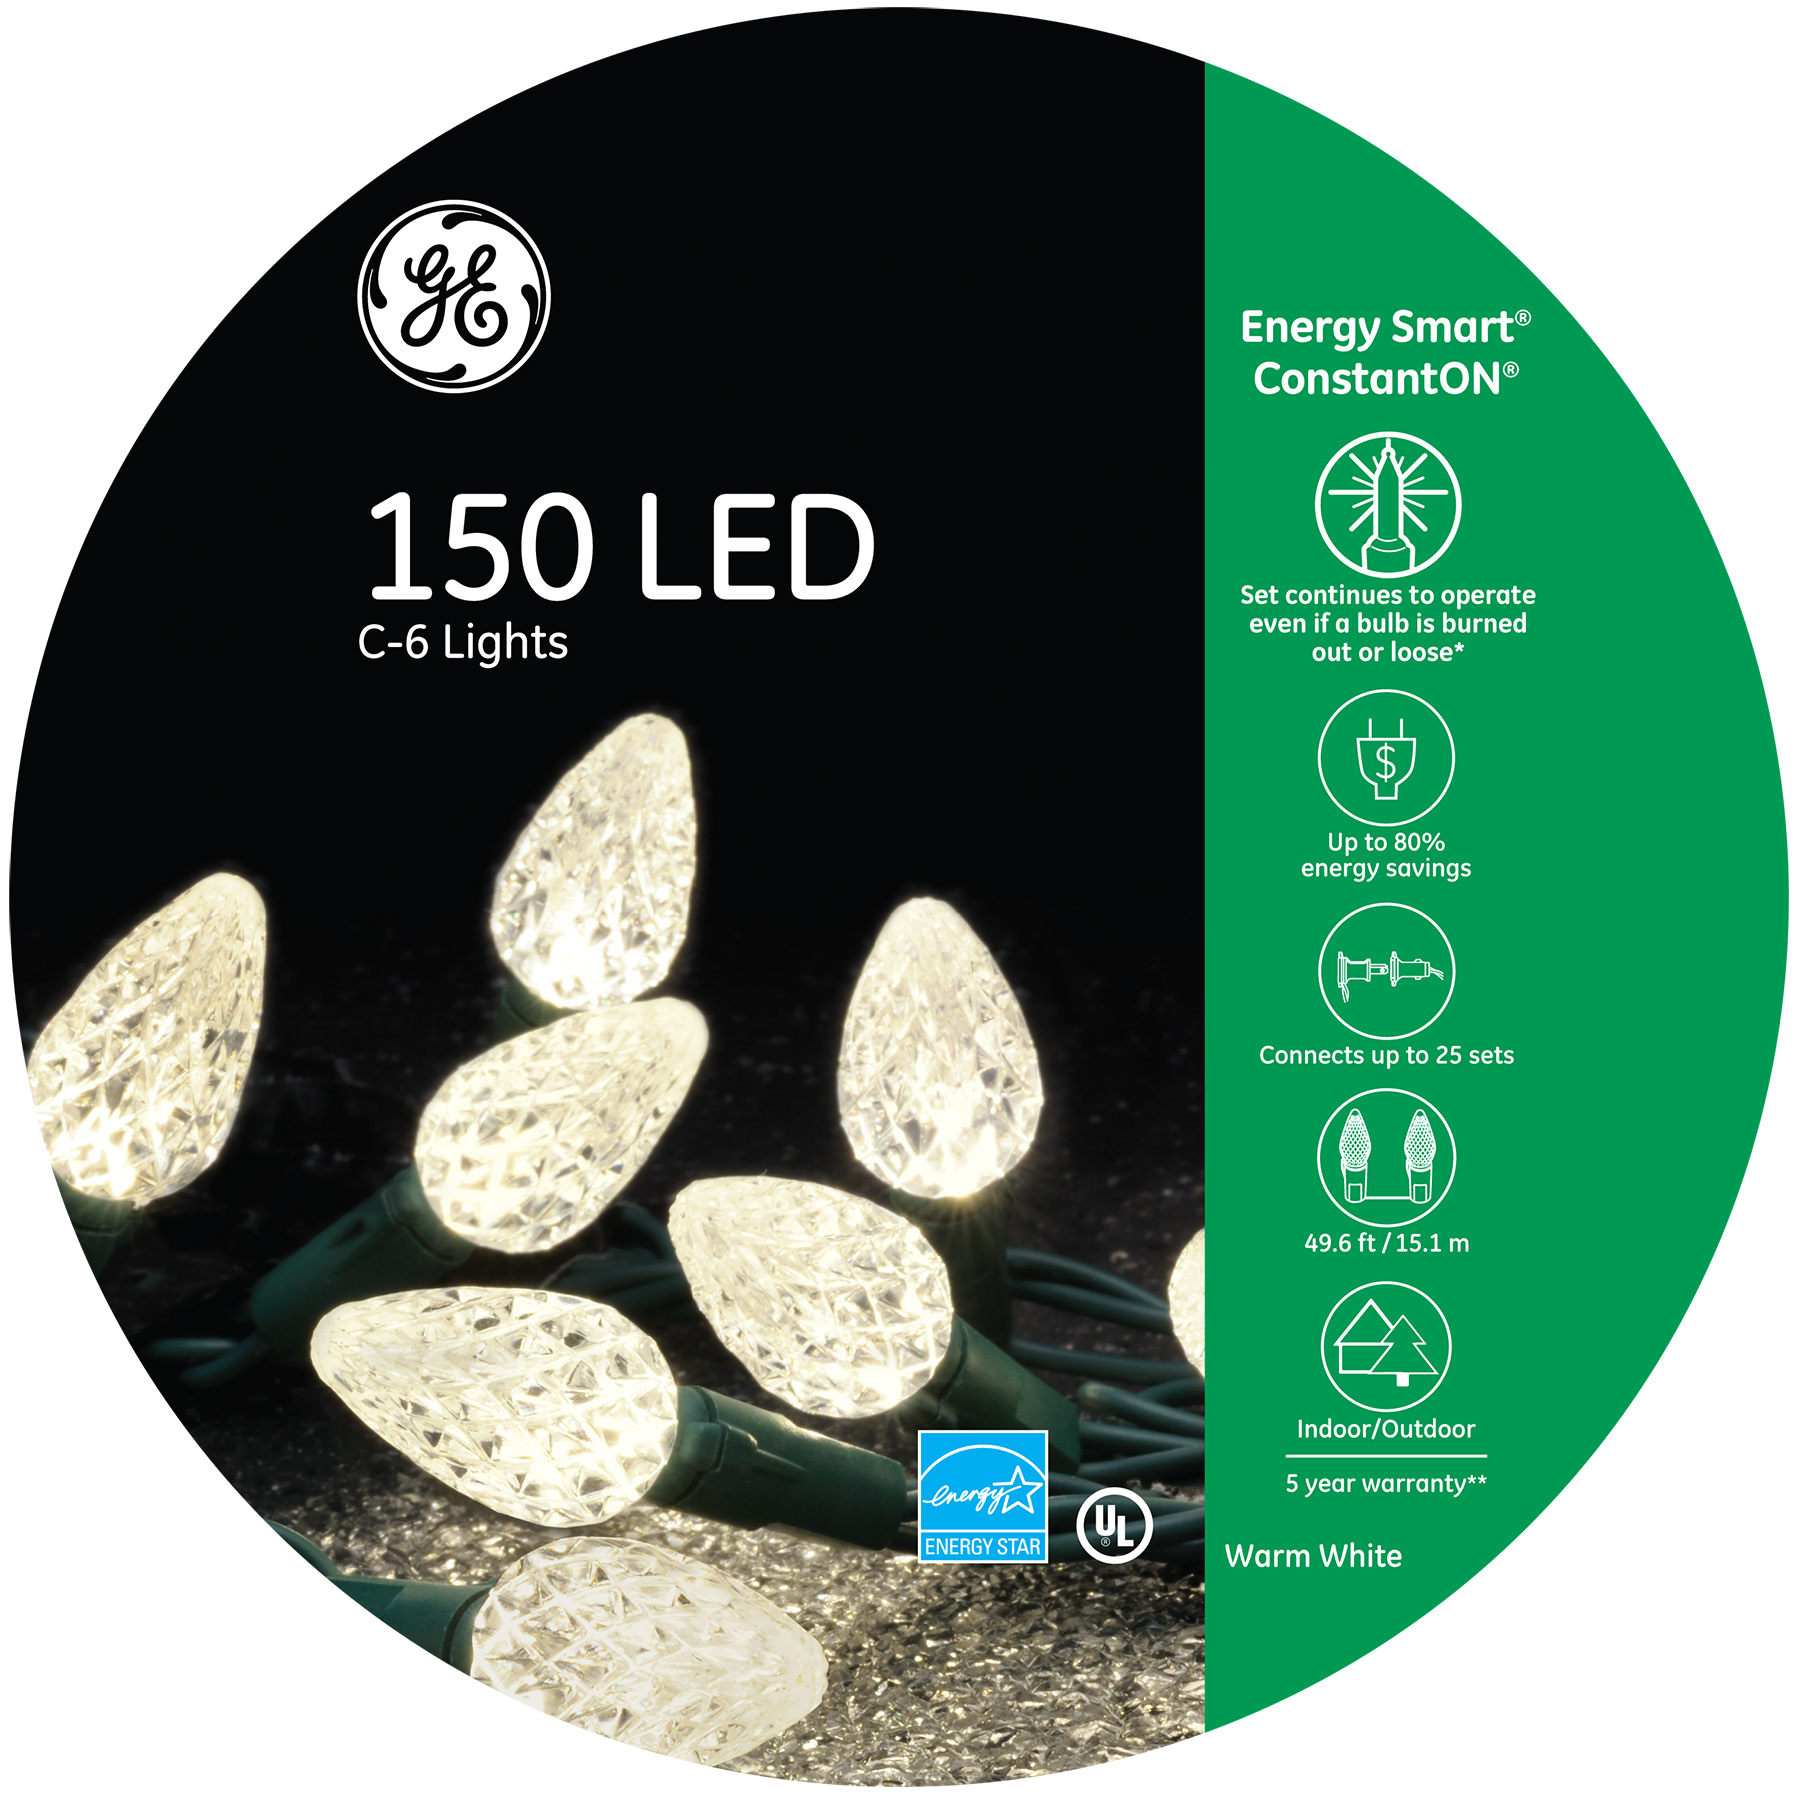 97936 Ge Energy Smart 174 Led C 6 Lights 150ct Warm White